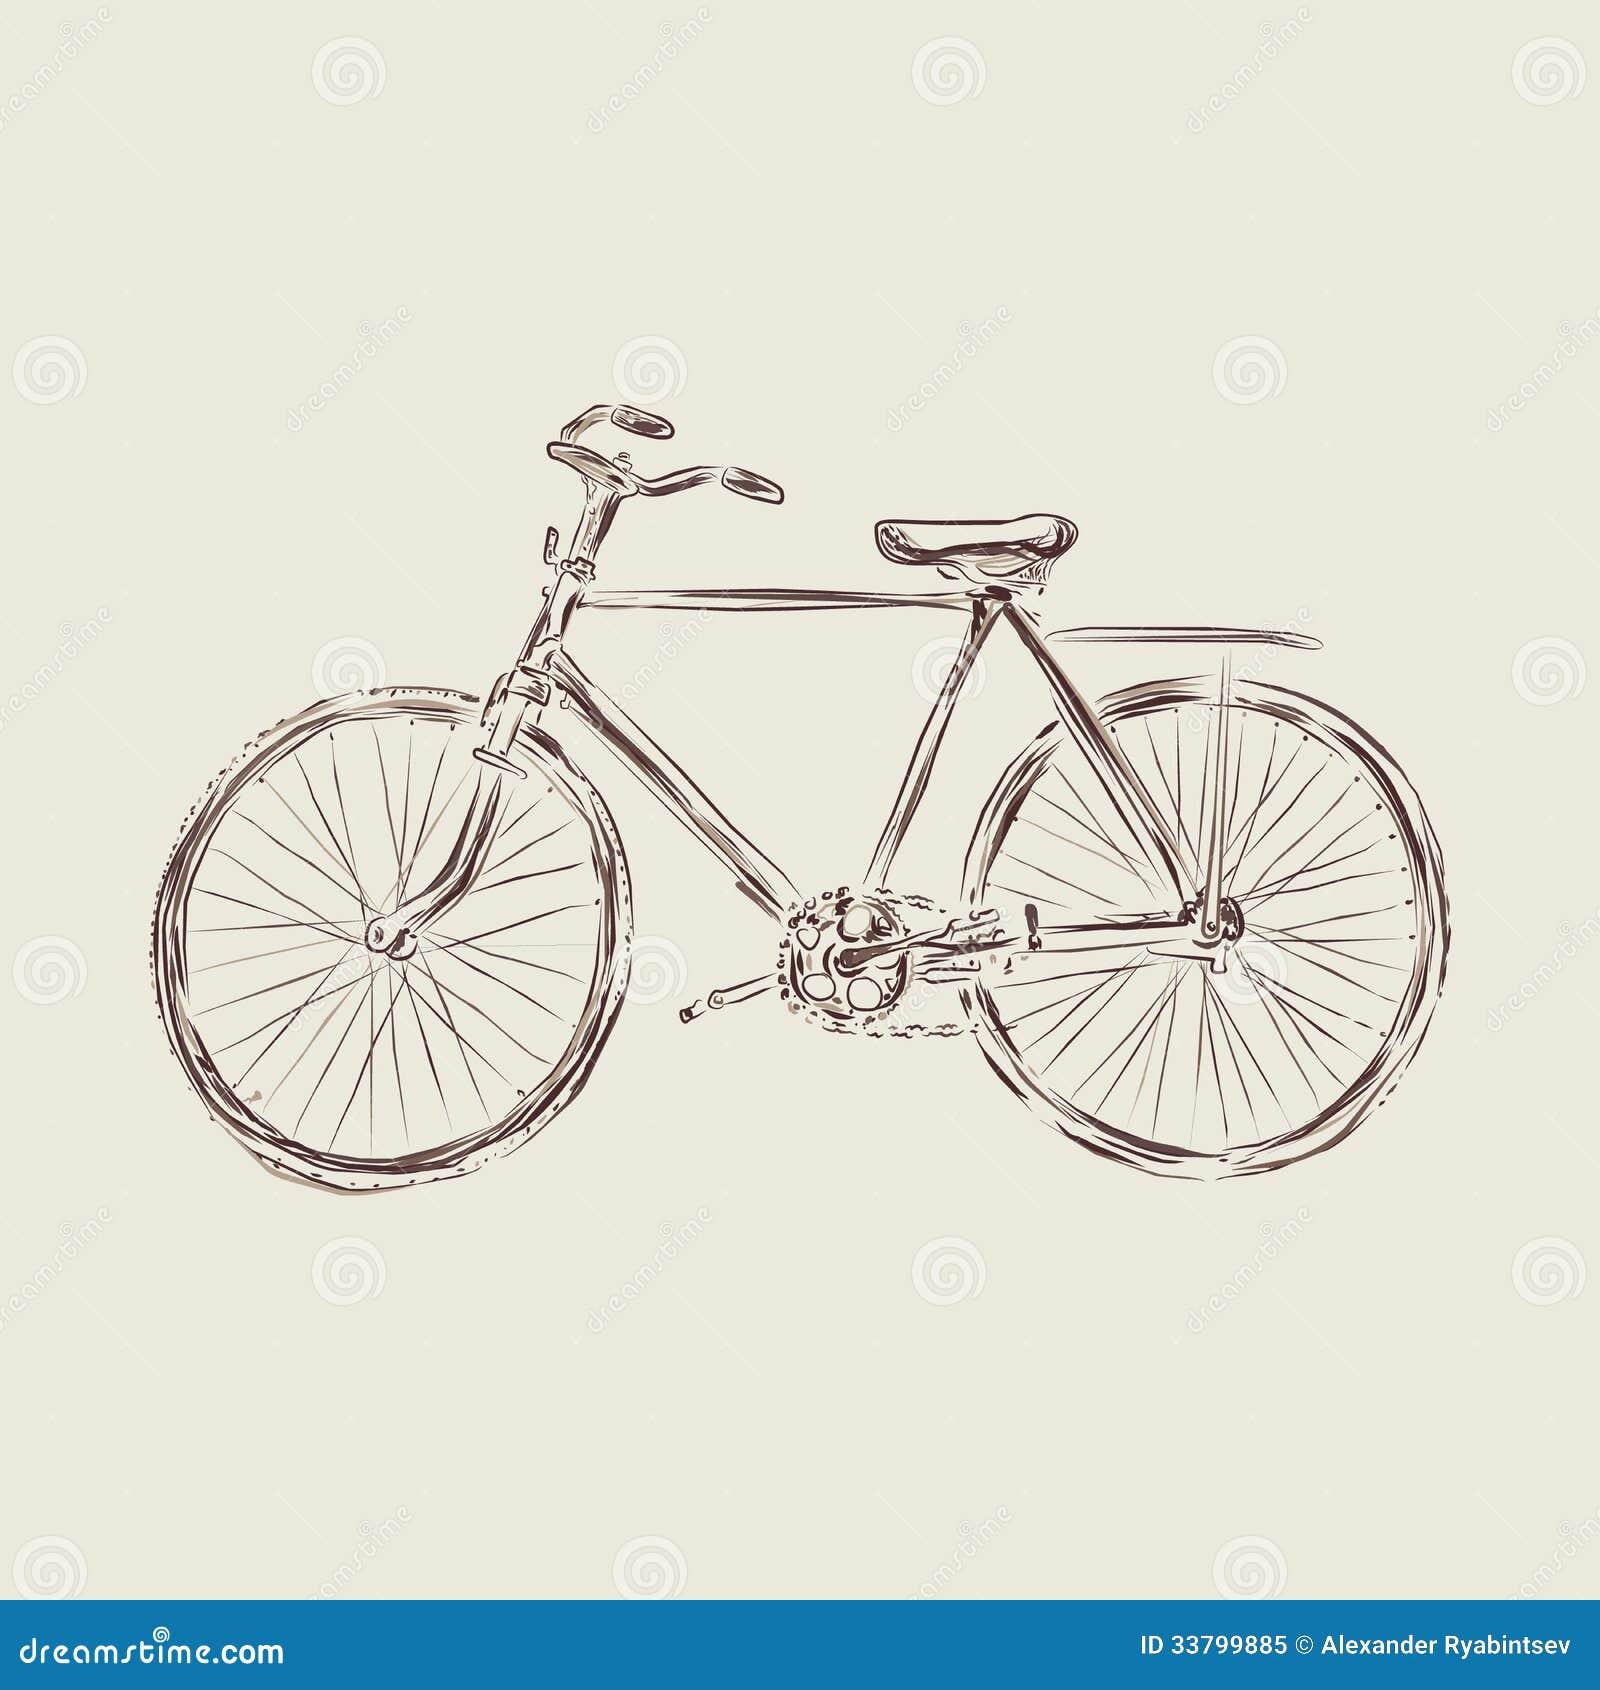 Retro Beach Illustration Royalty Free Stock Photo: Retro Vintage Bicycle Illustration Royalty Free Stock